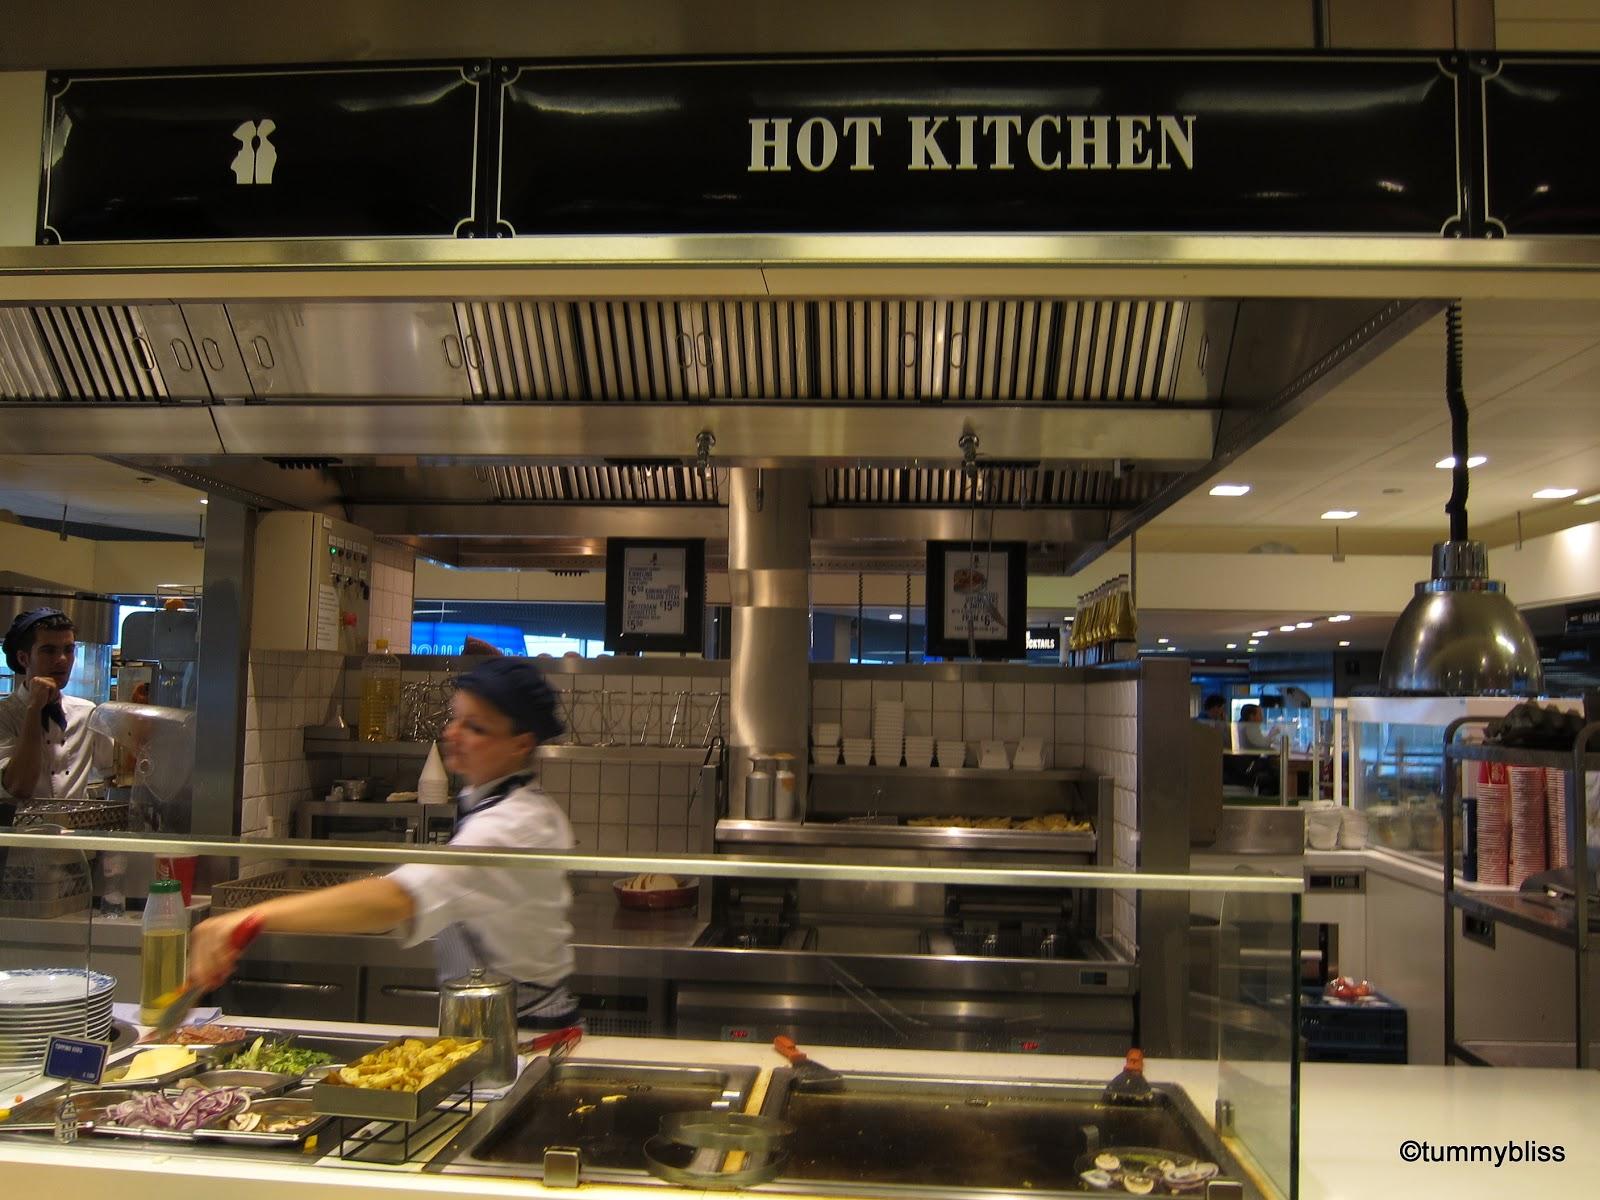 Comment Restaurants Airport However Dutch Kitchen